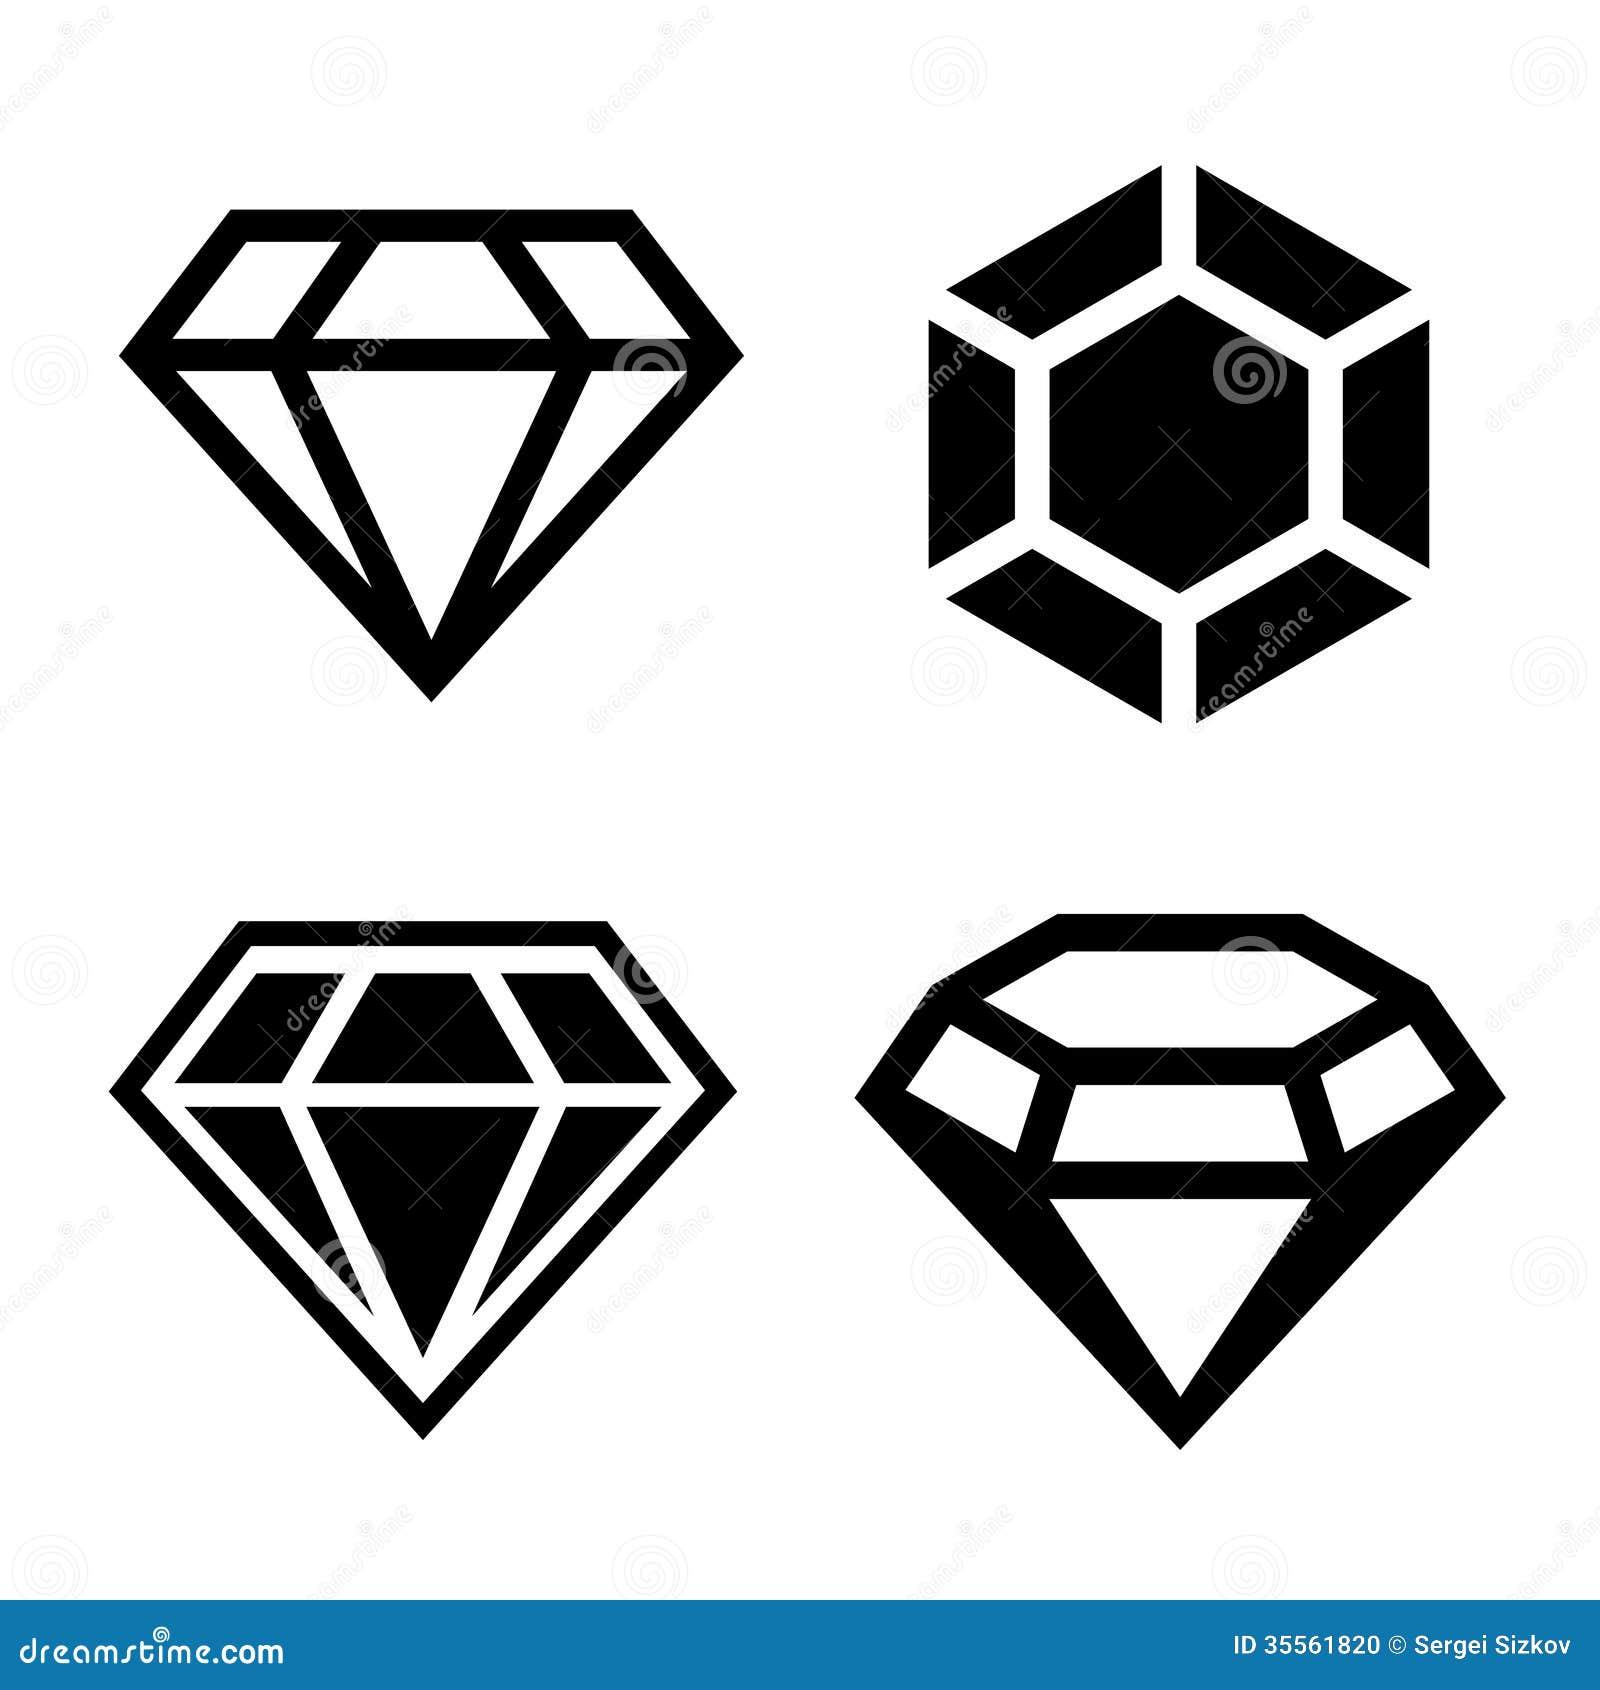 diamond vector icons set stock photo image 35561820 snowboarding clipart snowboard clip art black and white